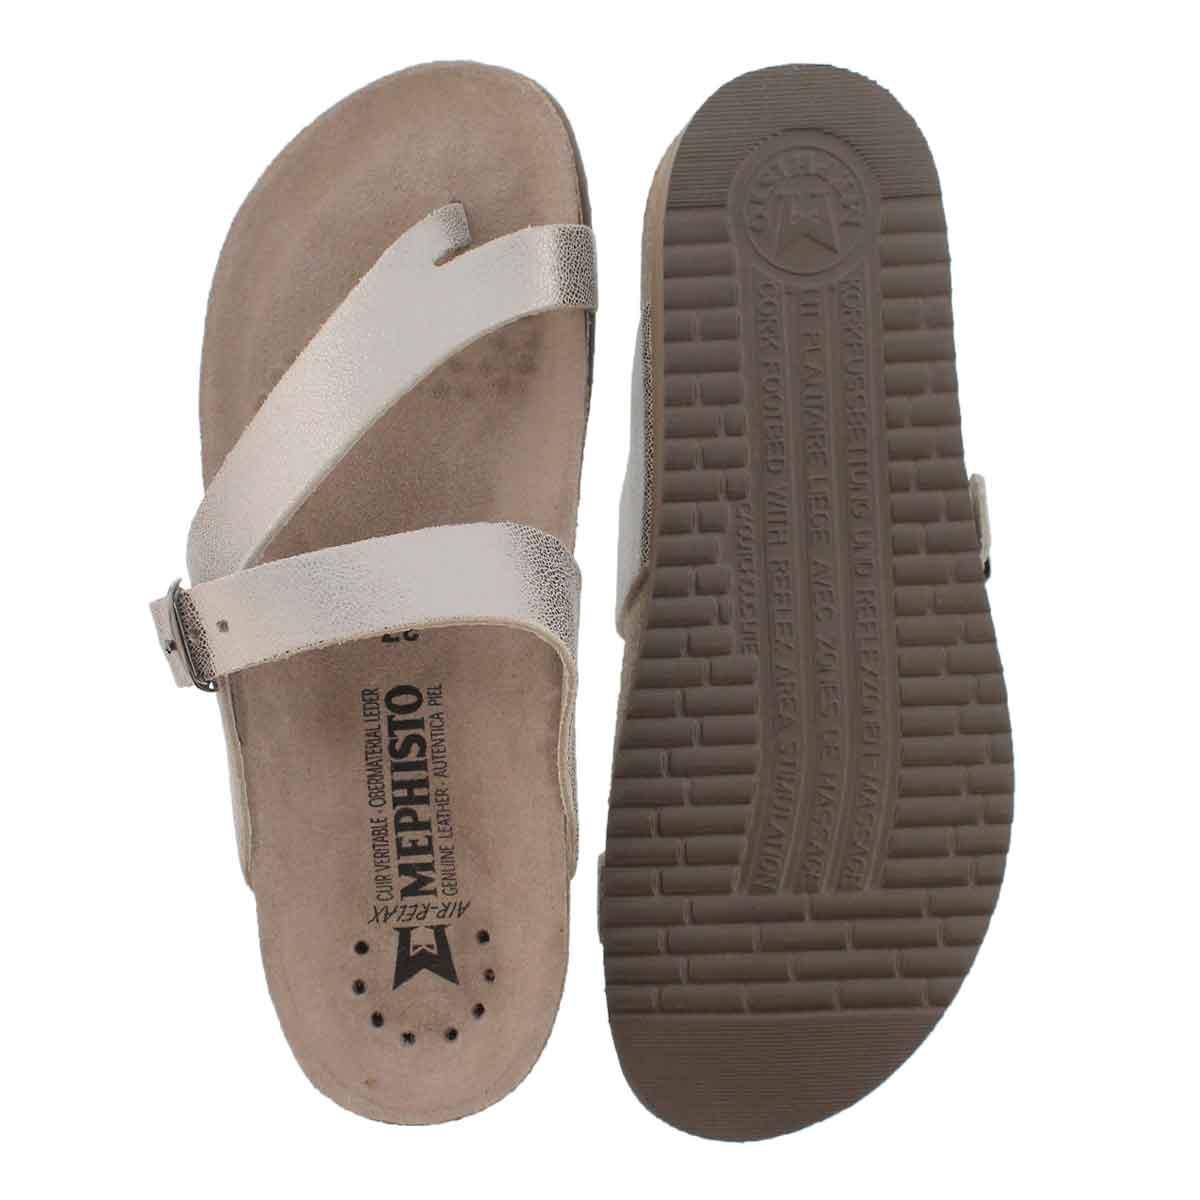 Lds Helen silver cork footbed thong